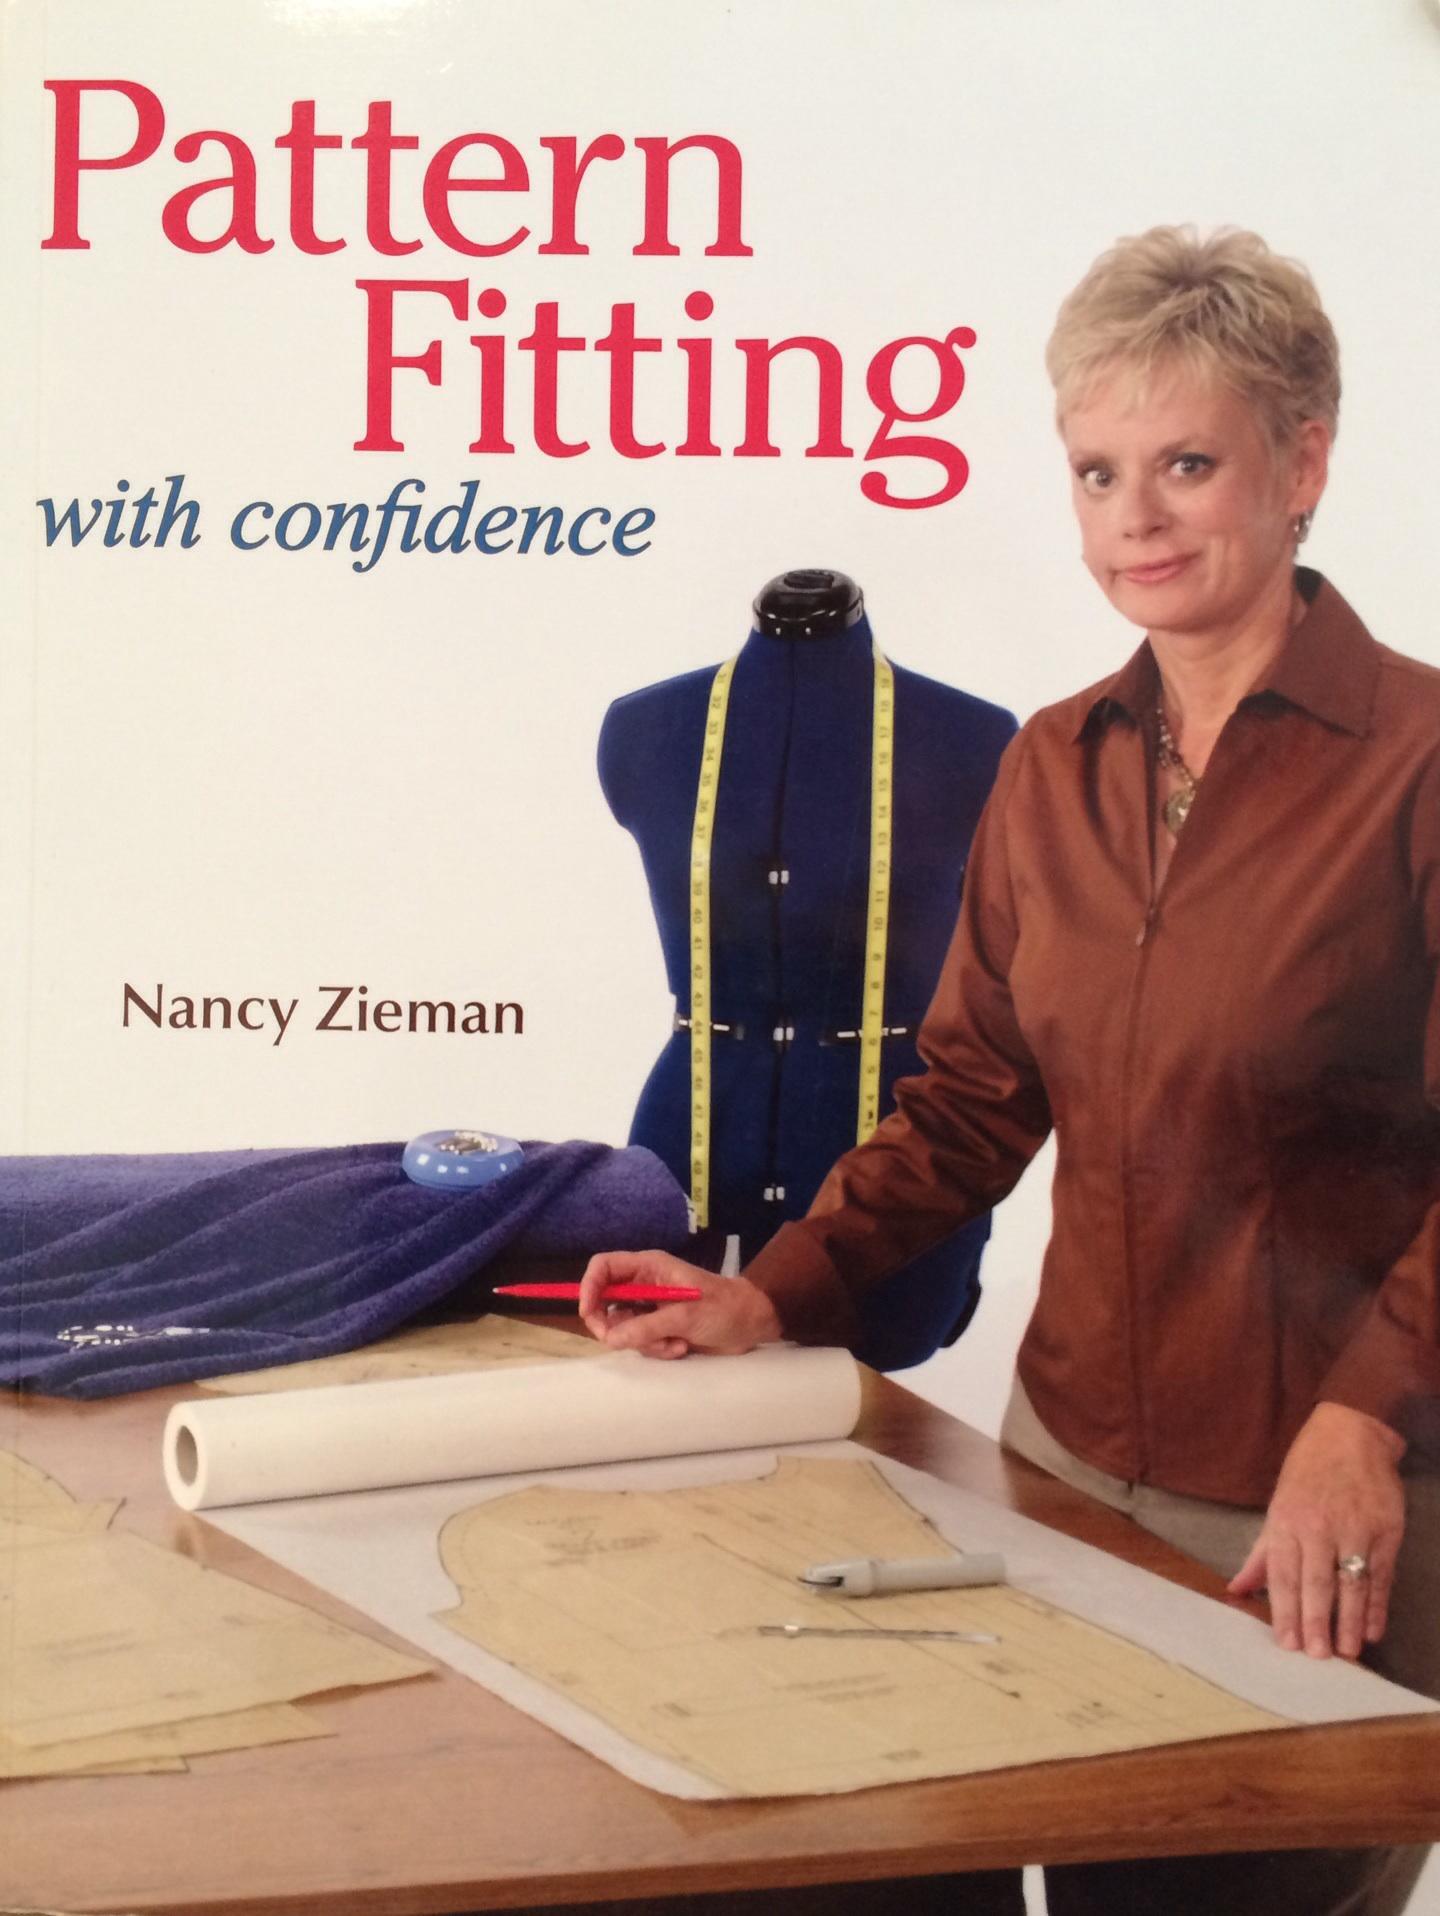 Showy Image Chanel Jacket Jet Set Sewing Nancy Zieman Died Nancy Zieman Death Notice houzz 01 Nancy Zieman Death